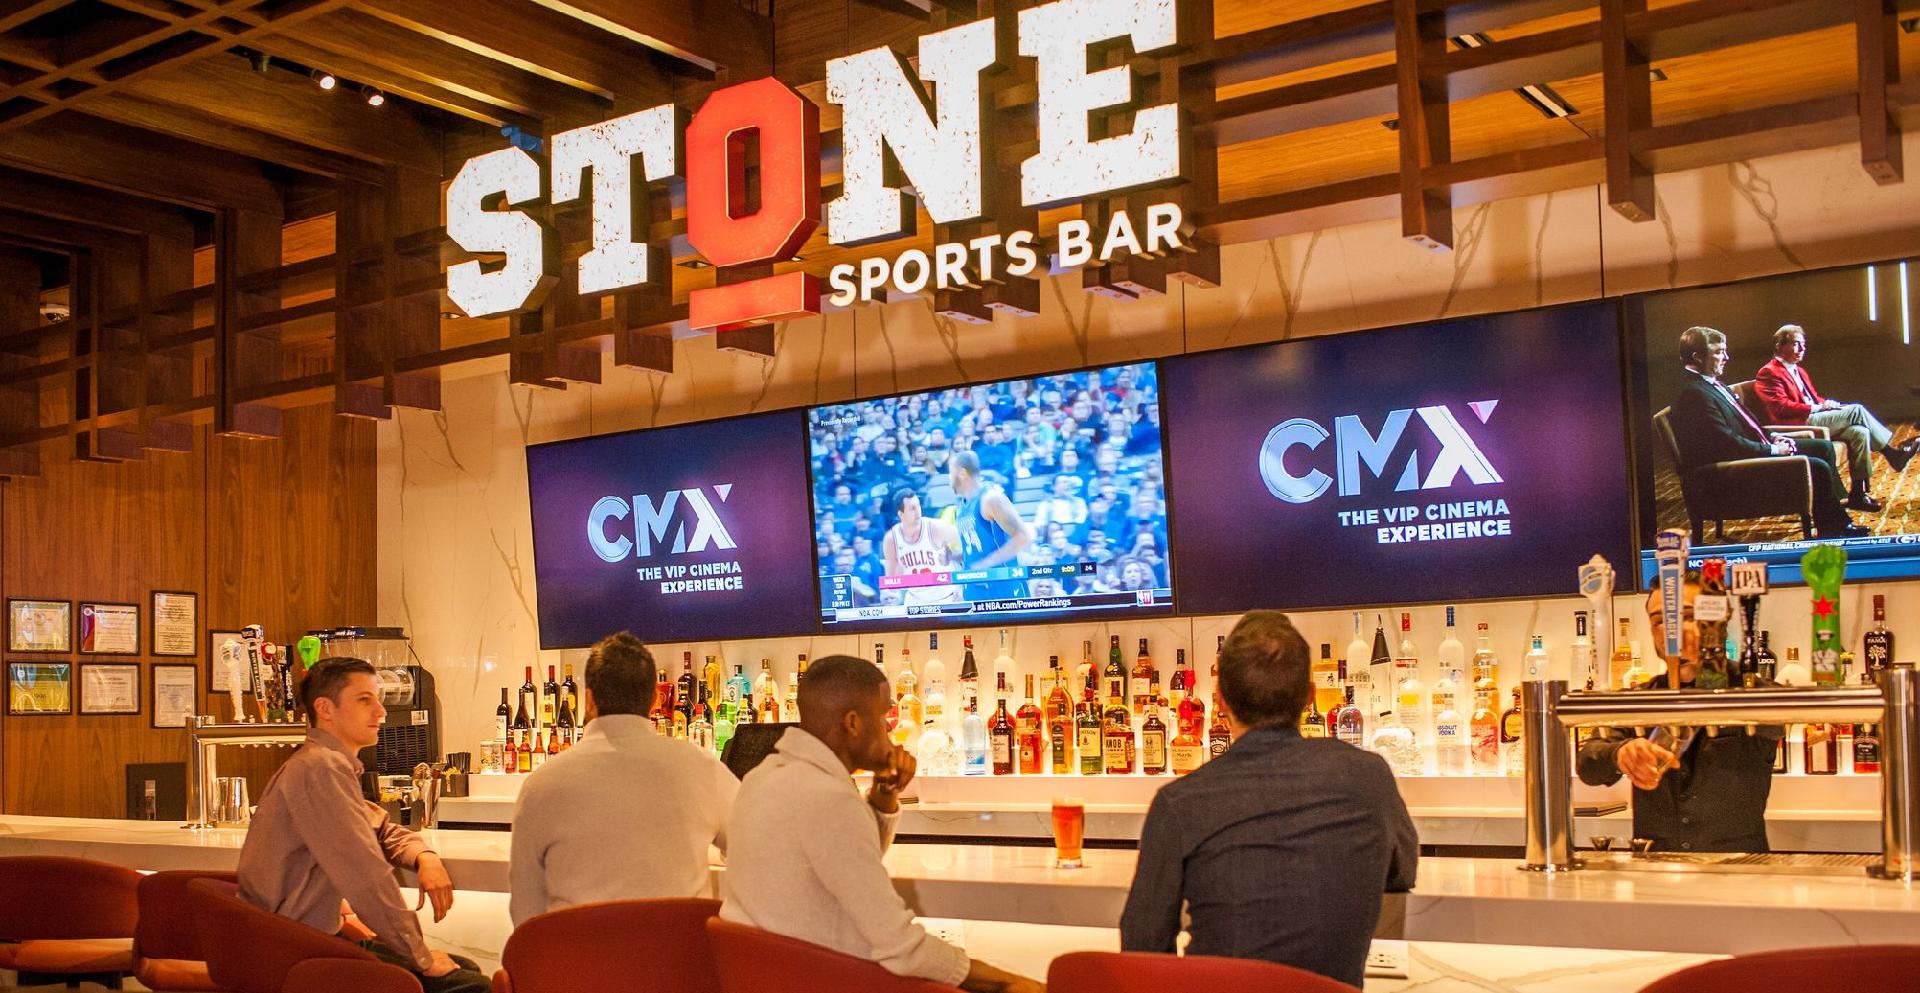 CMX STONE BAR